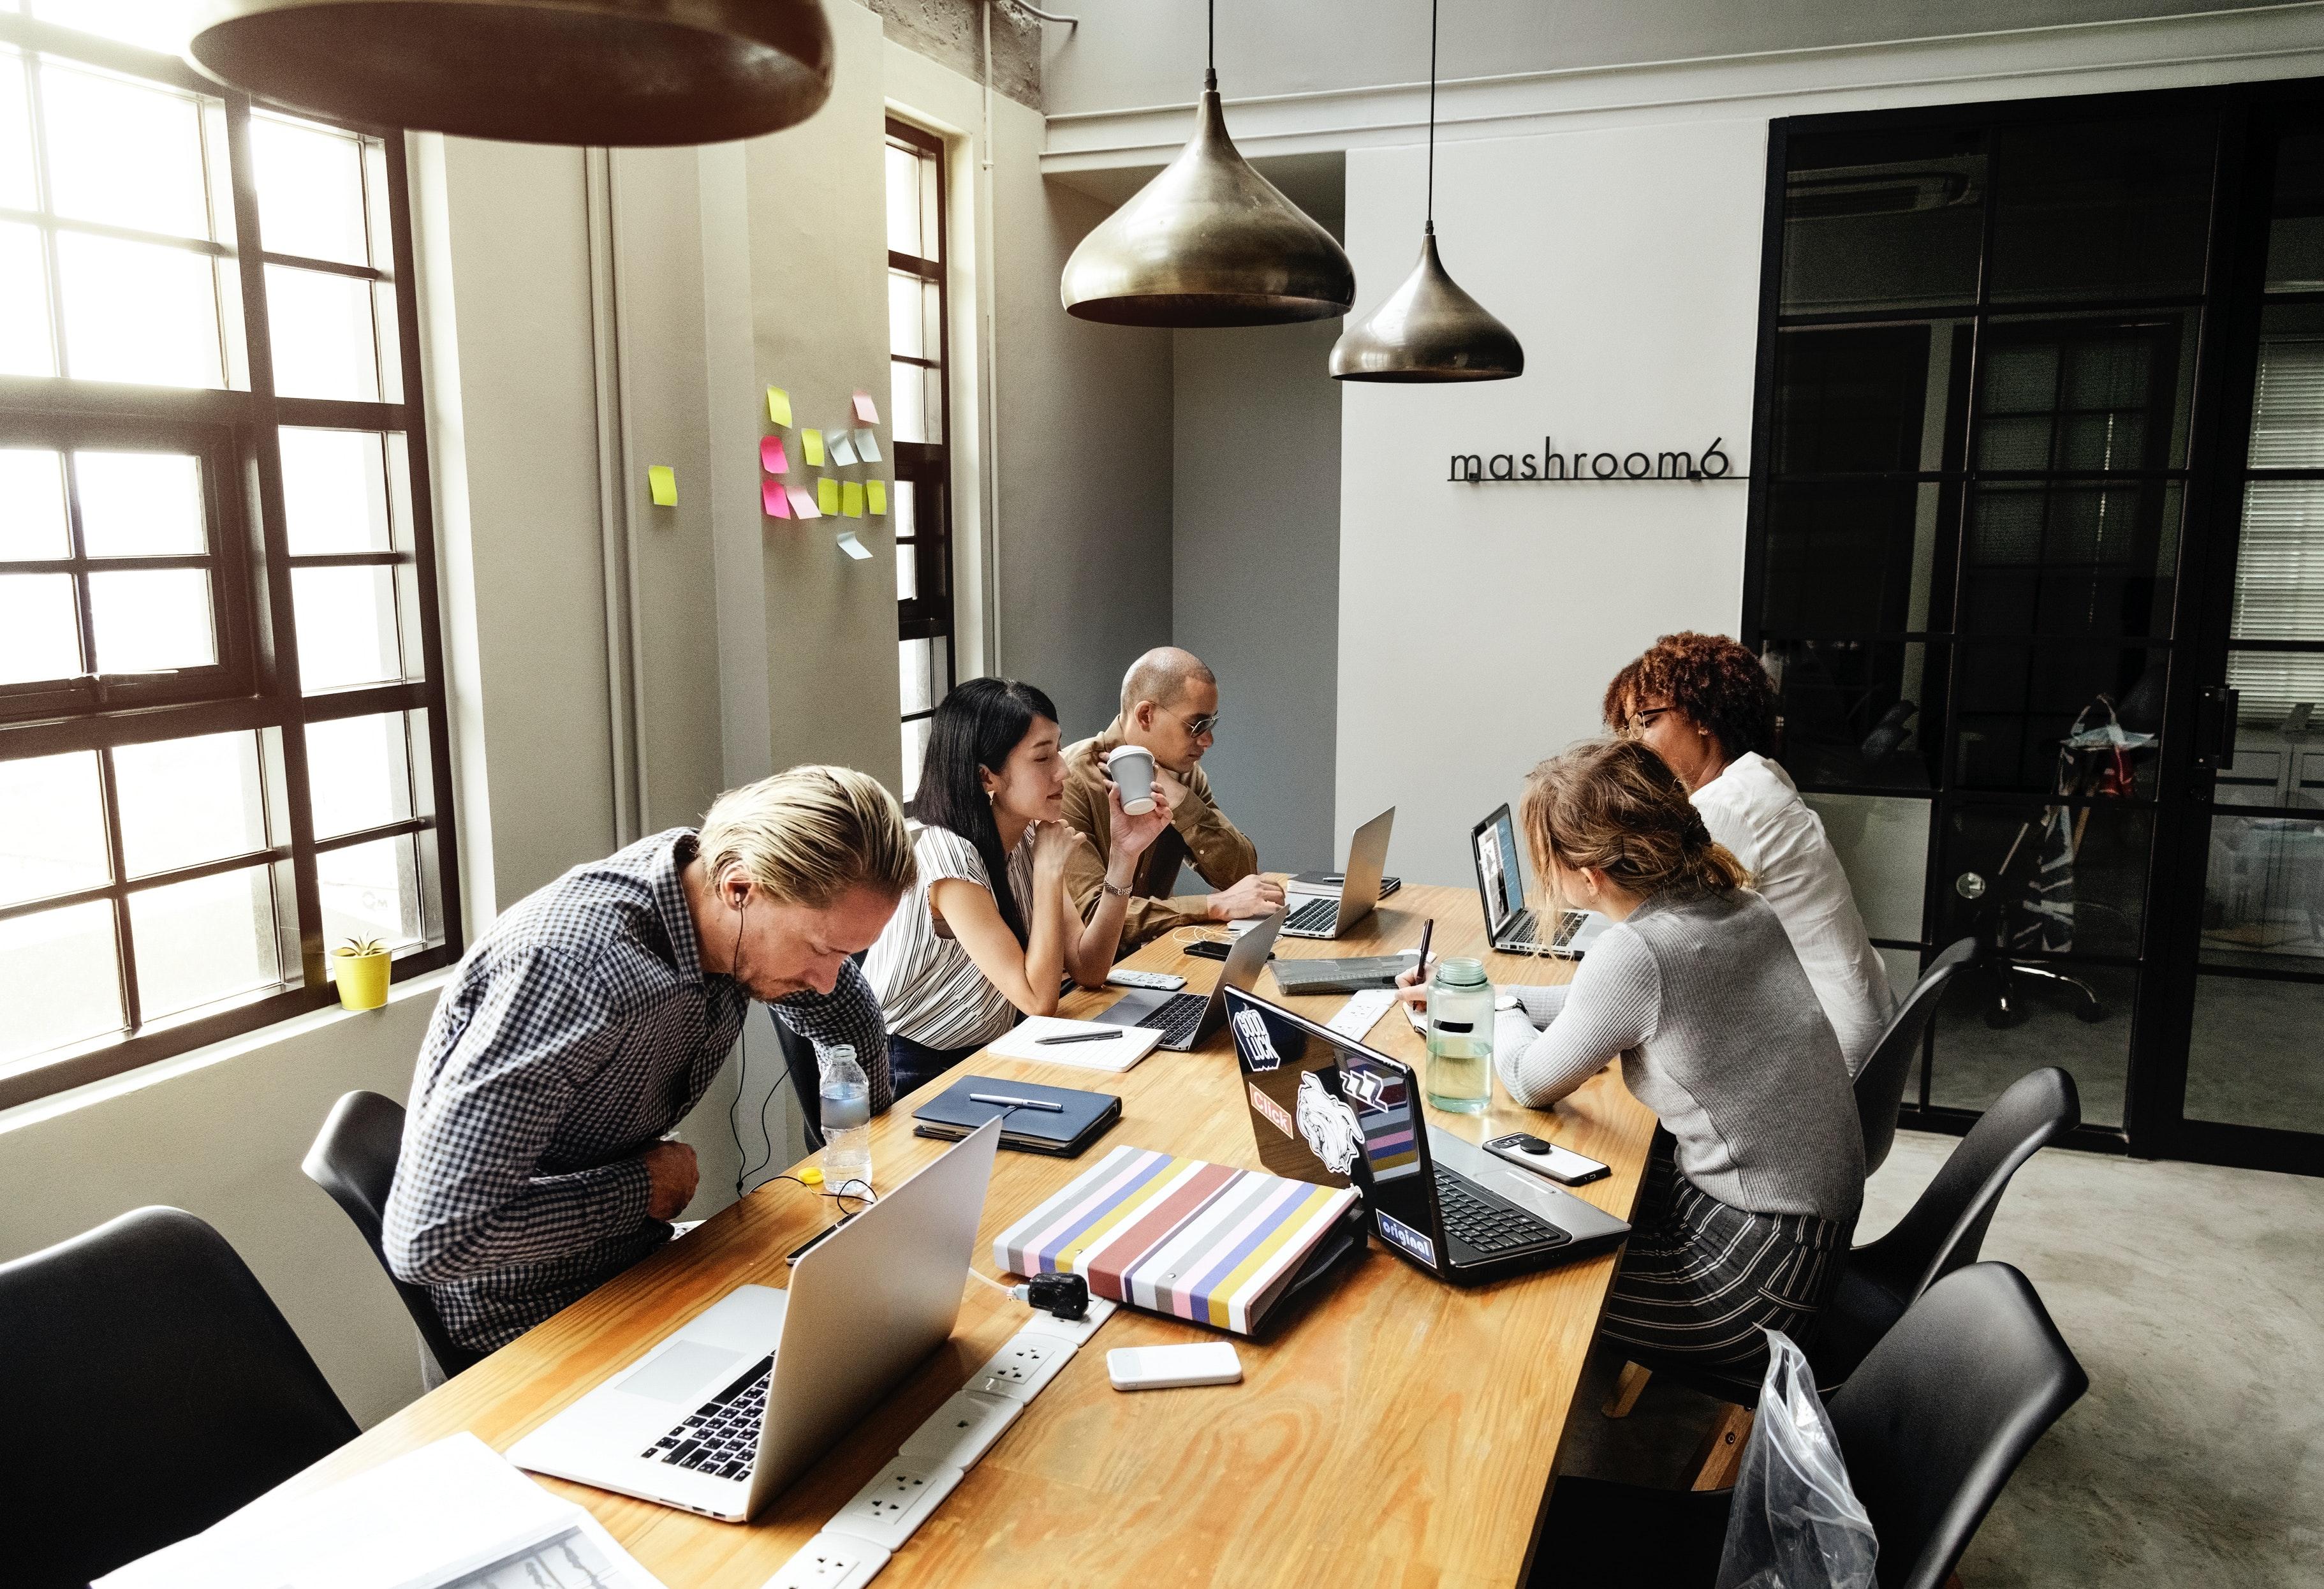 brainstorming-colleagues-communication-1204649